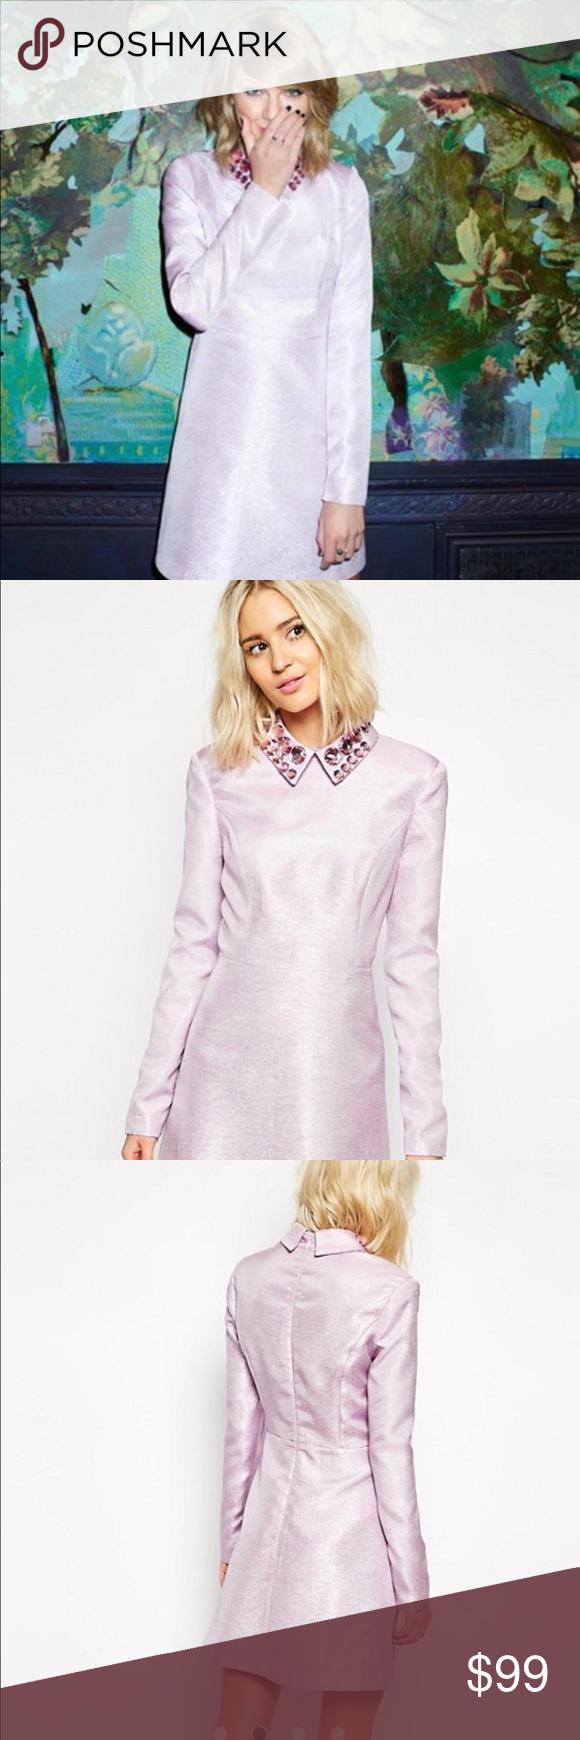 47d0fd4612726 NWT ASOS BLACK label glitter dress with gem collar NWT ASOS black label  pink glitter dress